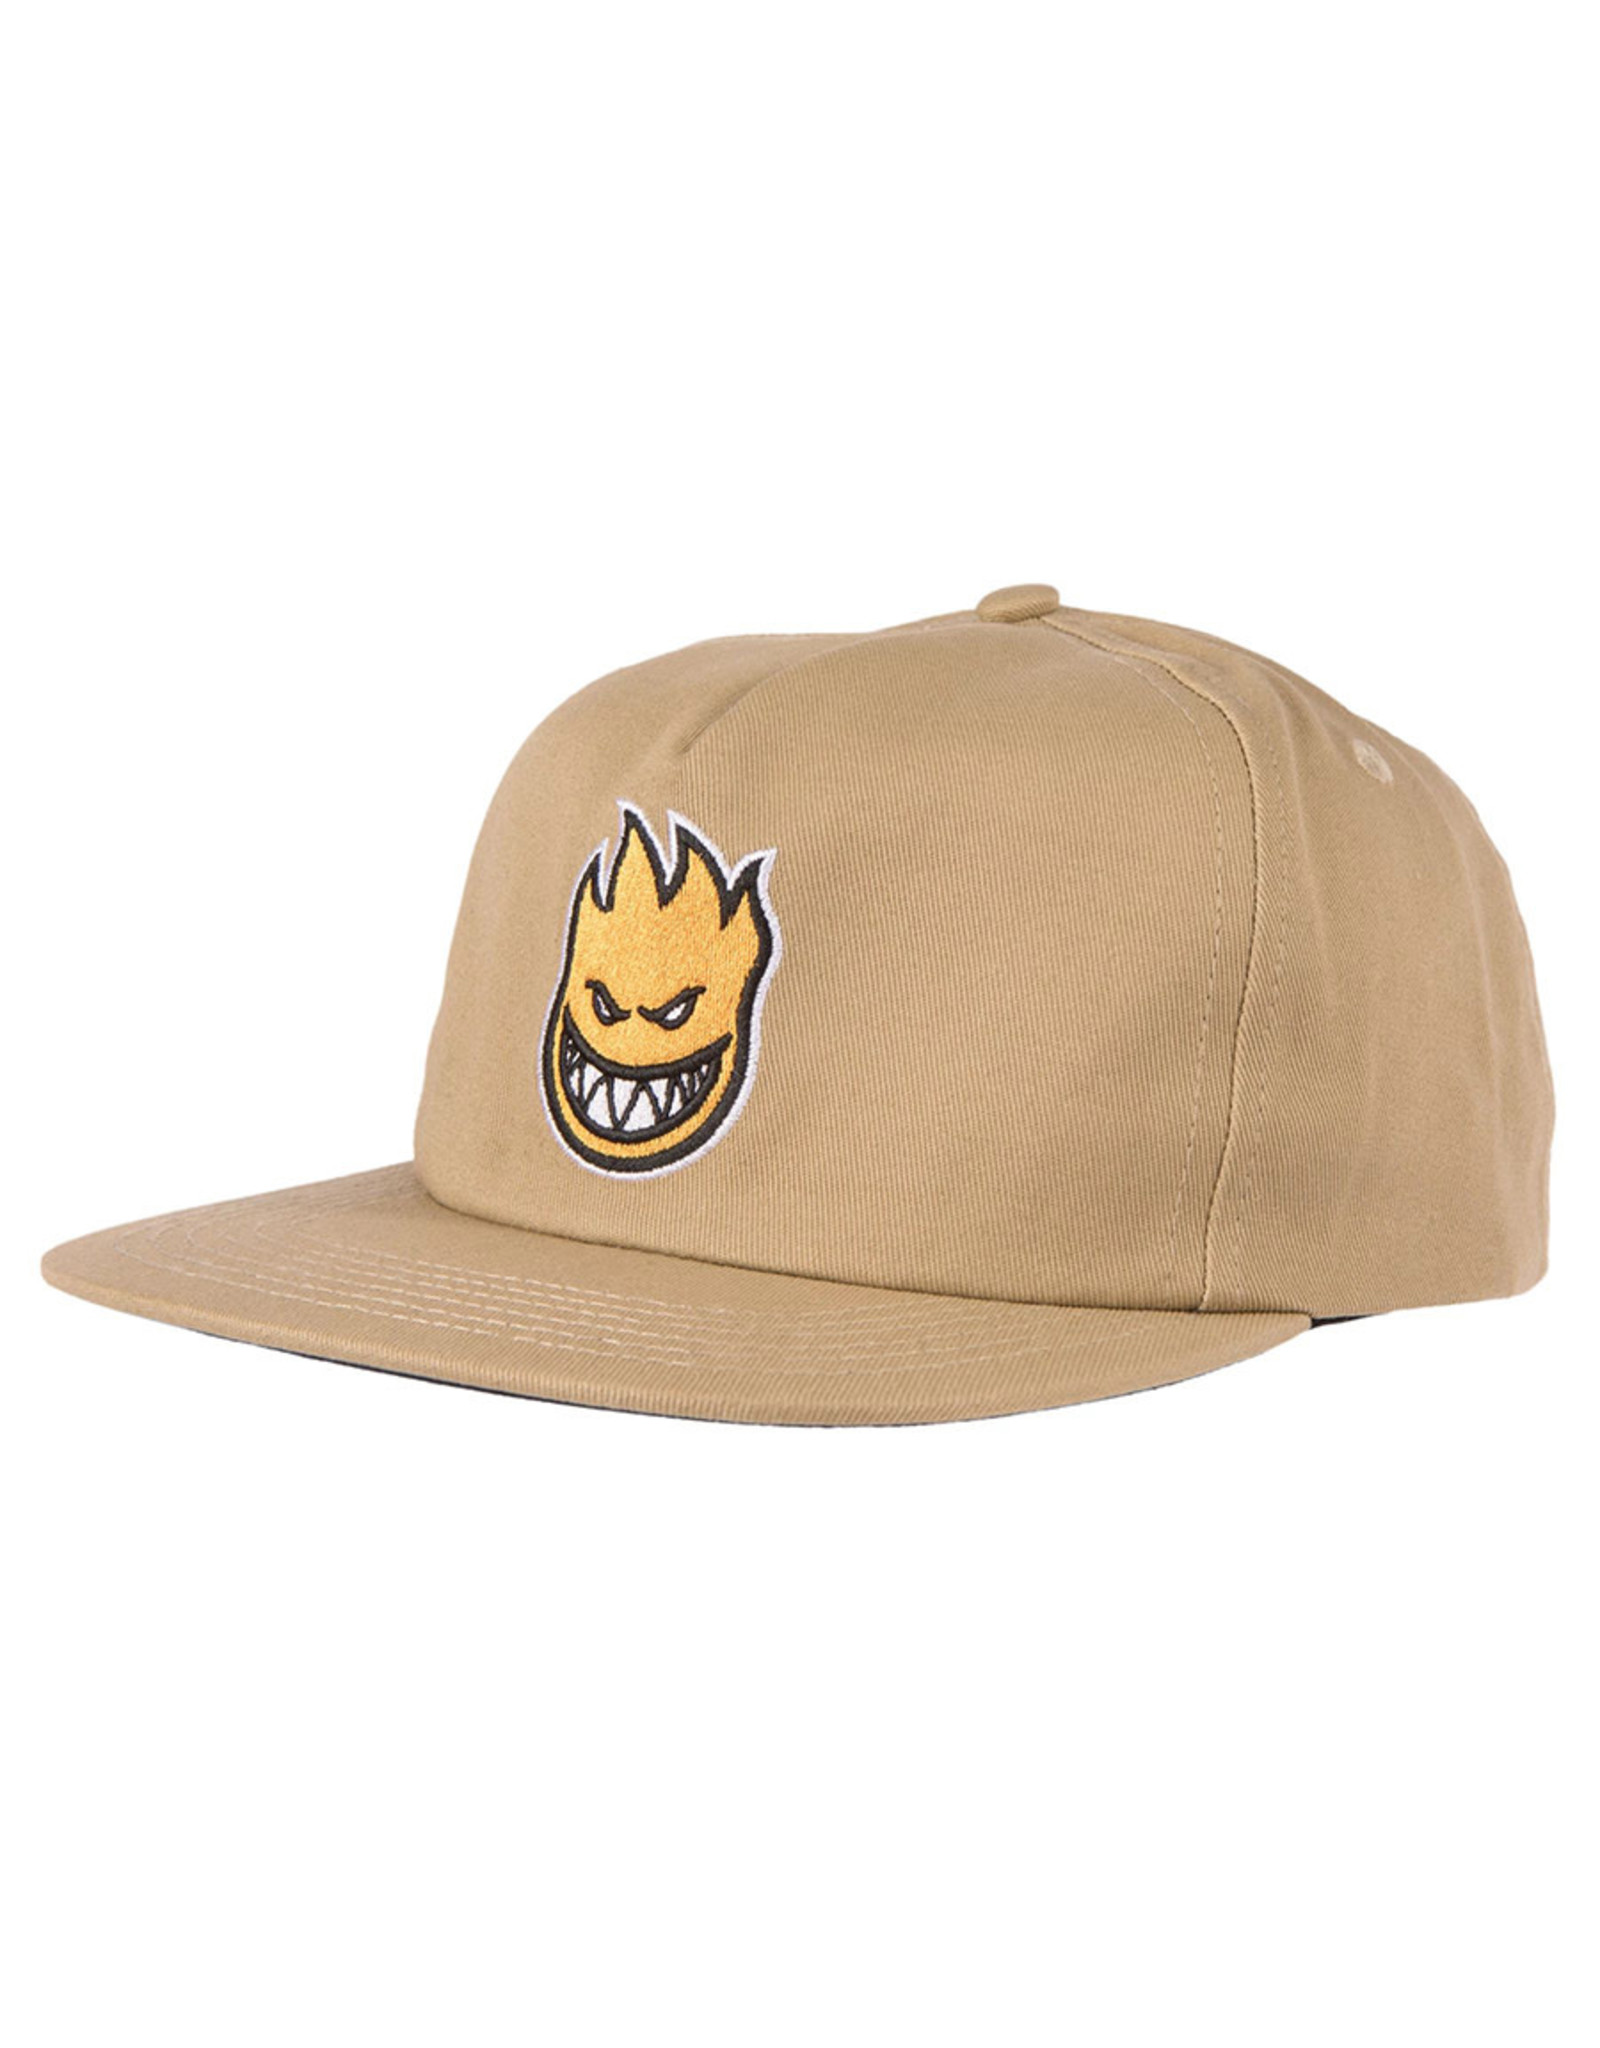 Spitfire Spitfire Hat Bighead Fill Snapback (Tan/Orange)